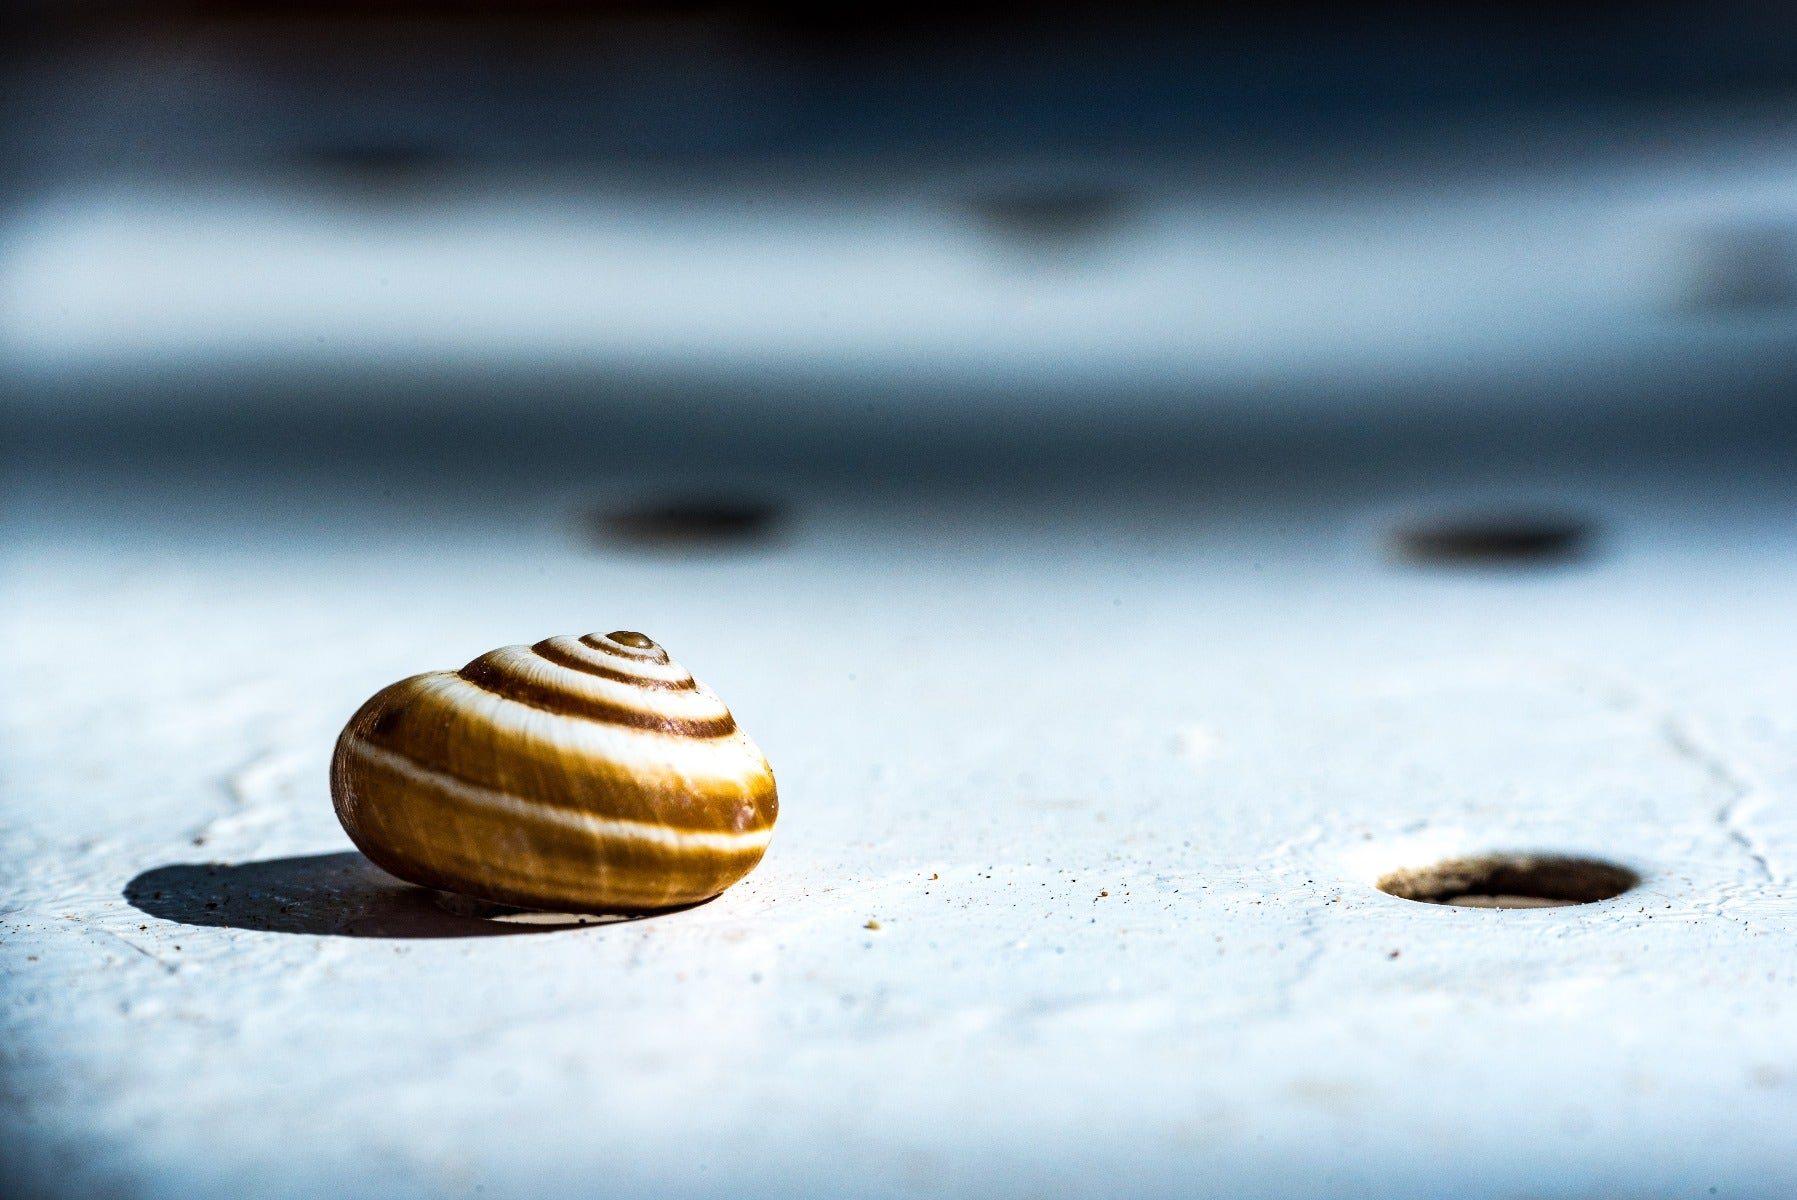 Snail with harsh lighting